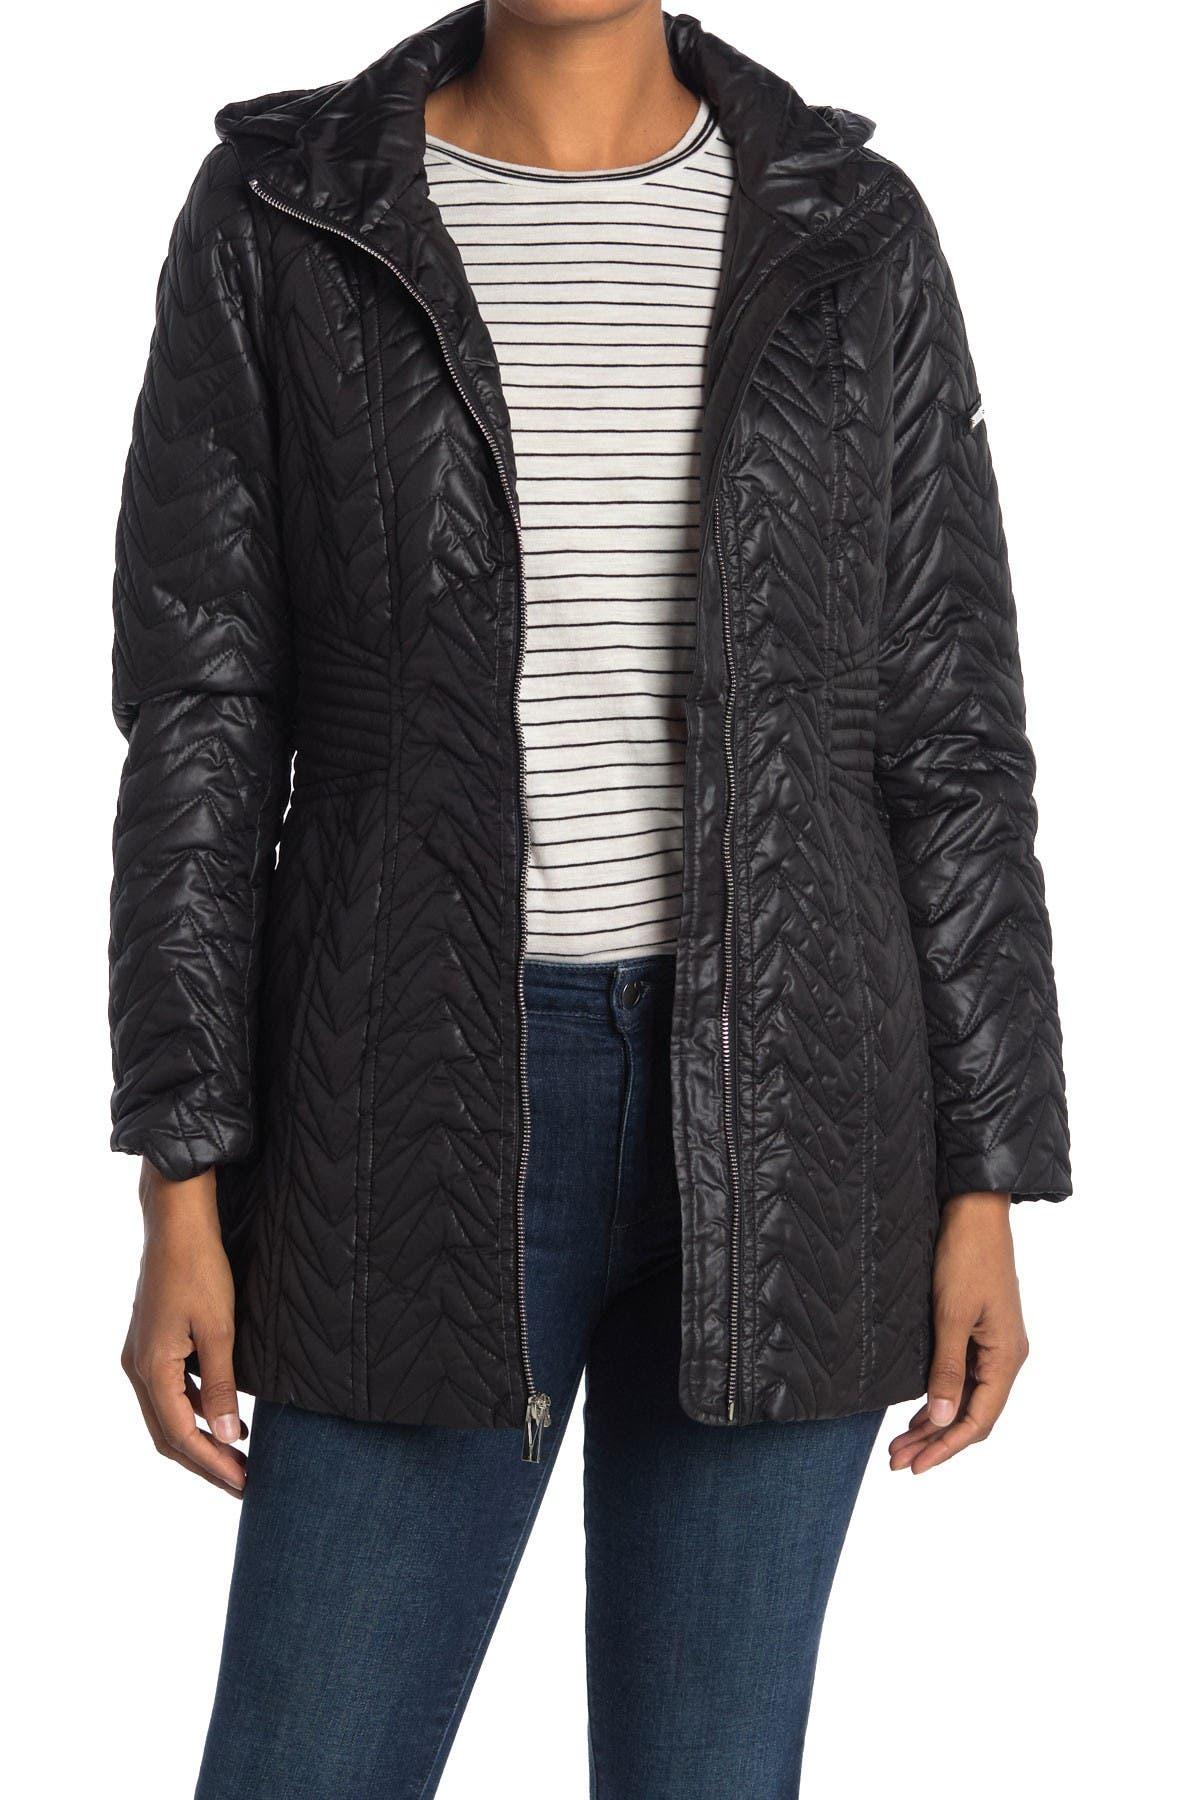 Image of Via Spiga Zigzag Detachable Hooded Puffer Jacket